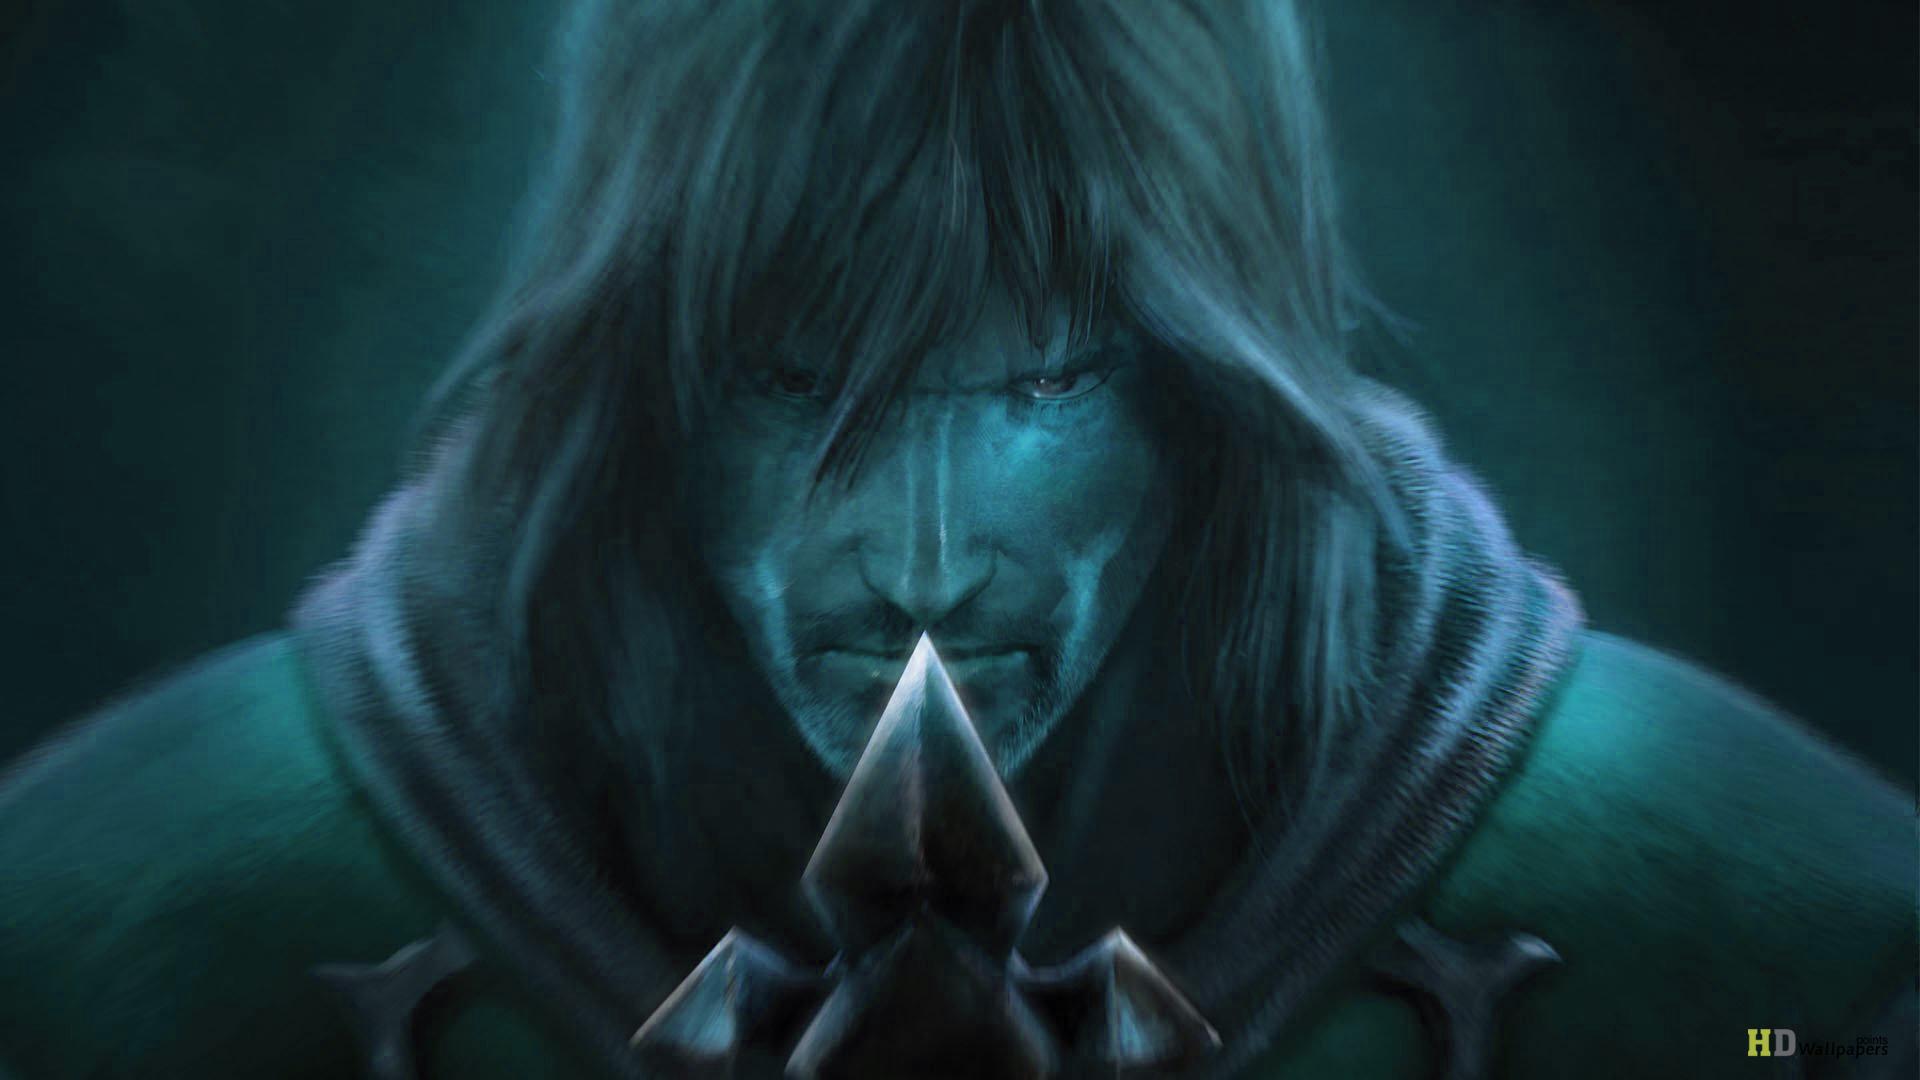 Hd wallpaper darkness - Castlevania Curse Of Darkness Hd Desktop Wallpaper Hd Wallpaper